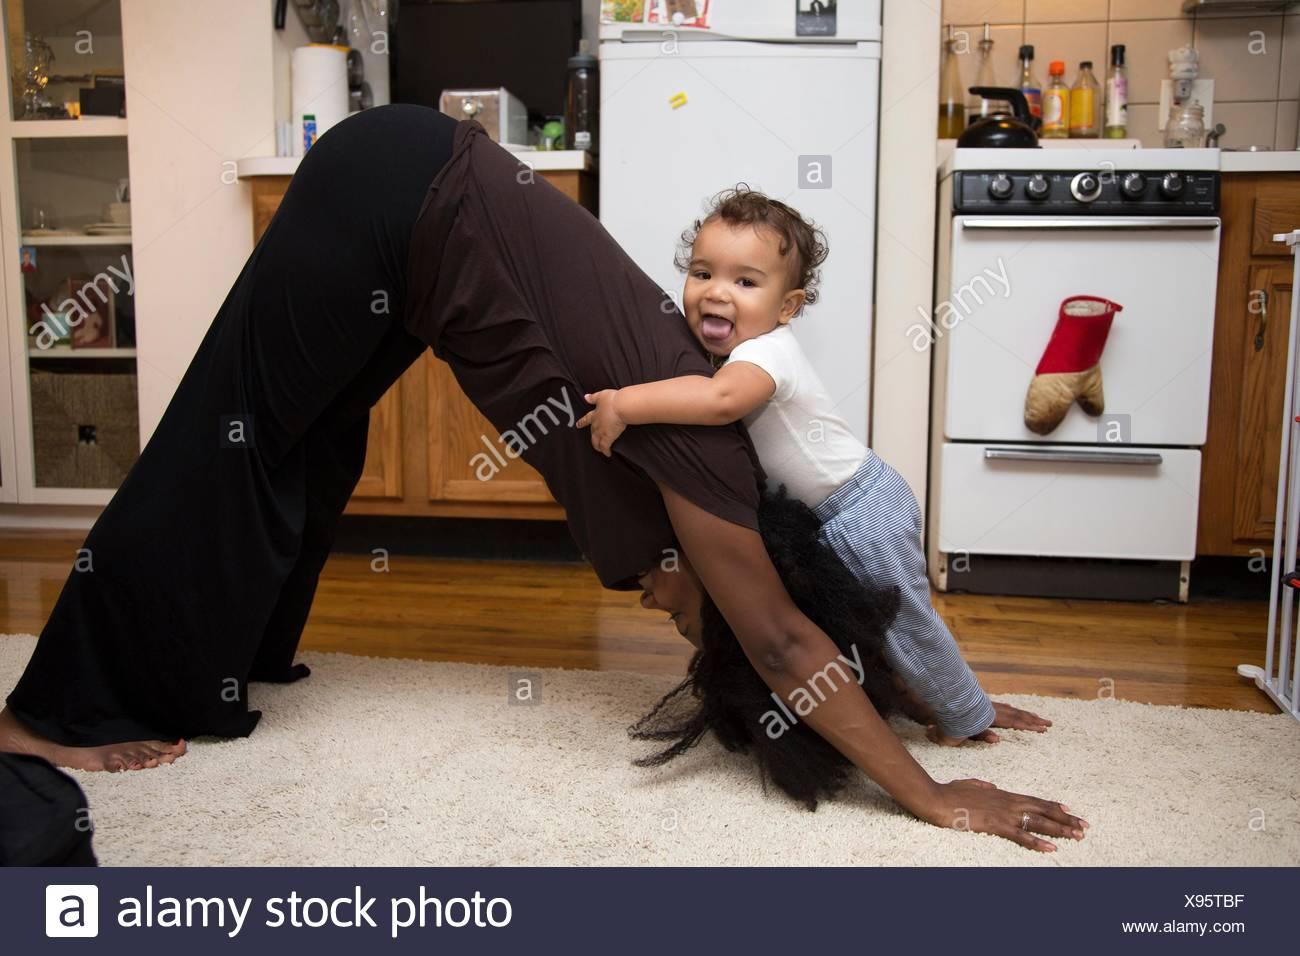 Mujer adulta media ejercen sobre la alfombra con infante hija Imagen De Stock